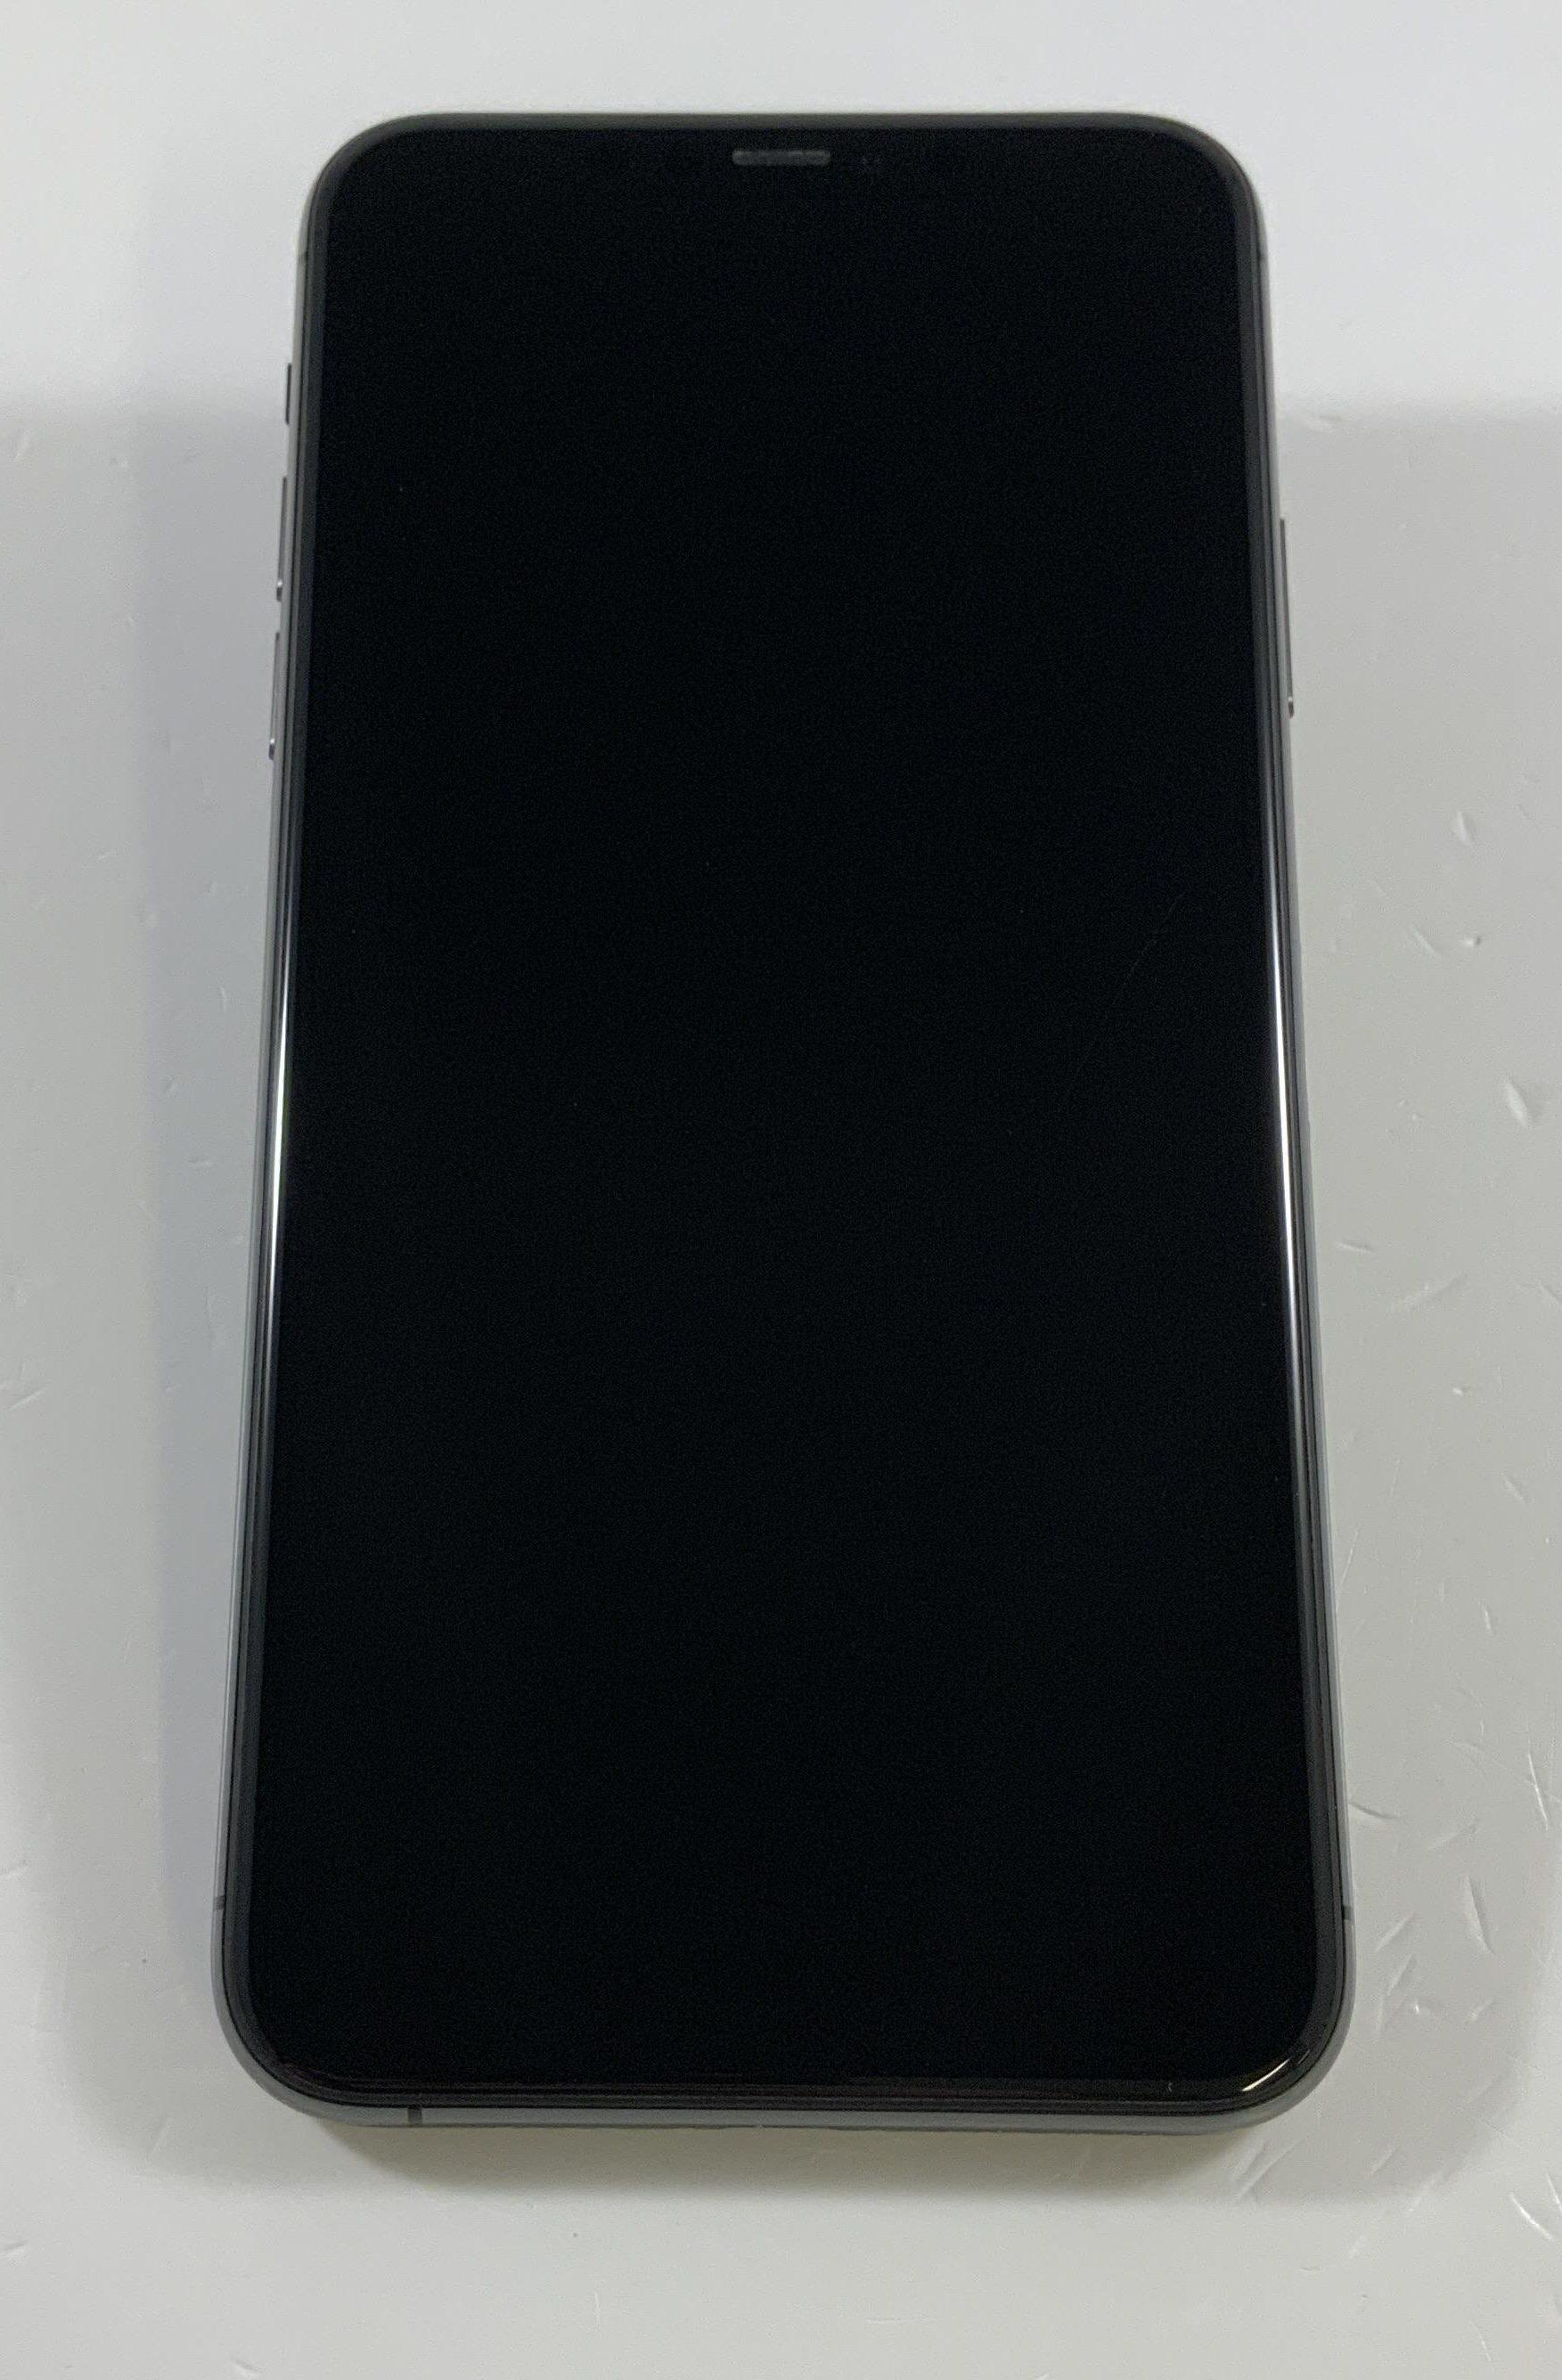 iPhone 11 Pro Max 256GB, 256GB, Space Gray, obraz 1